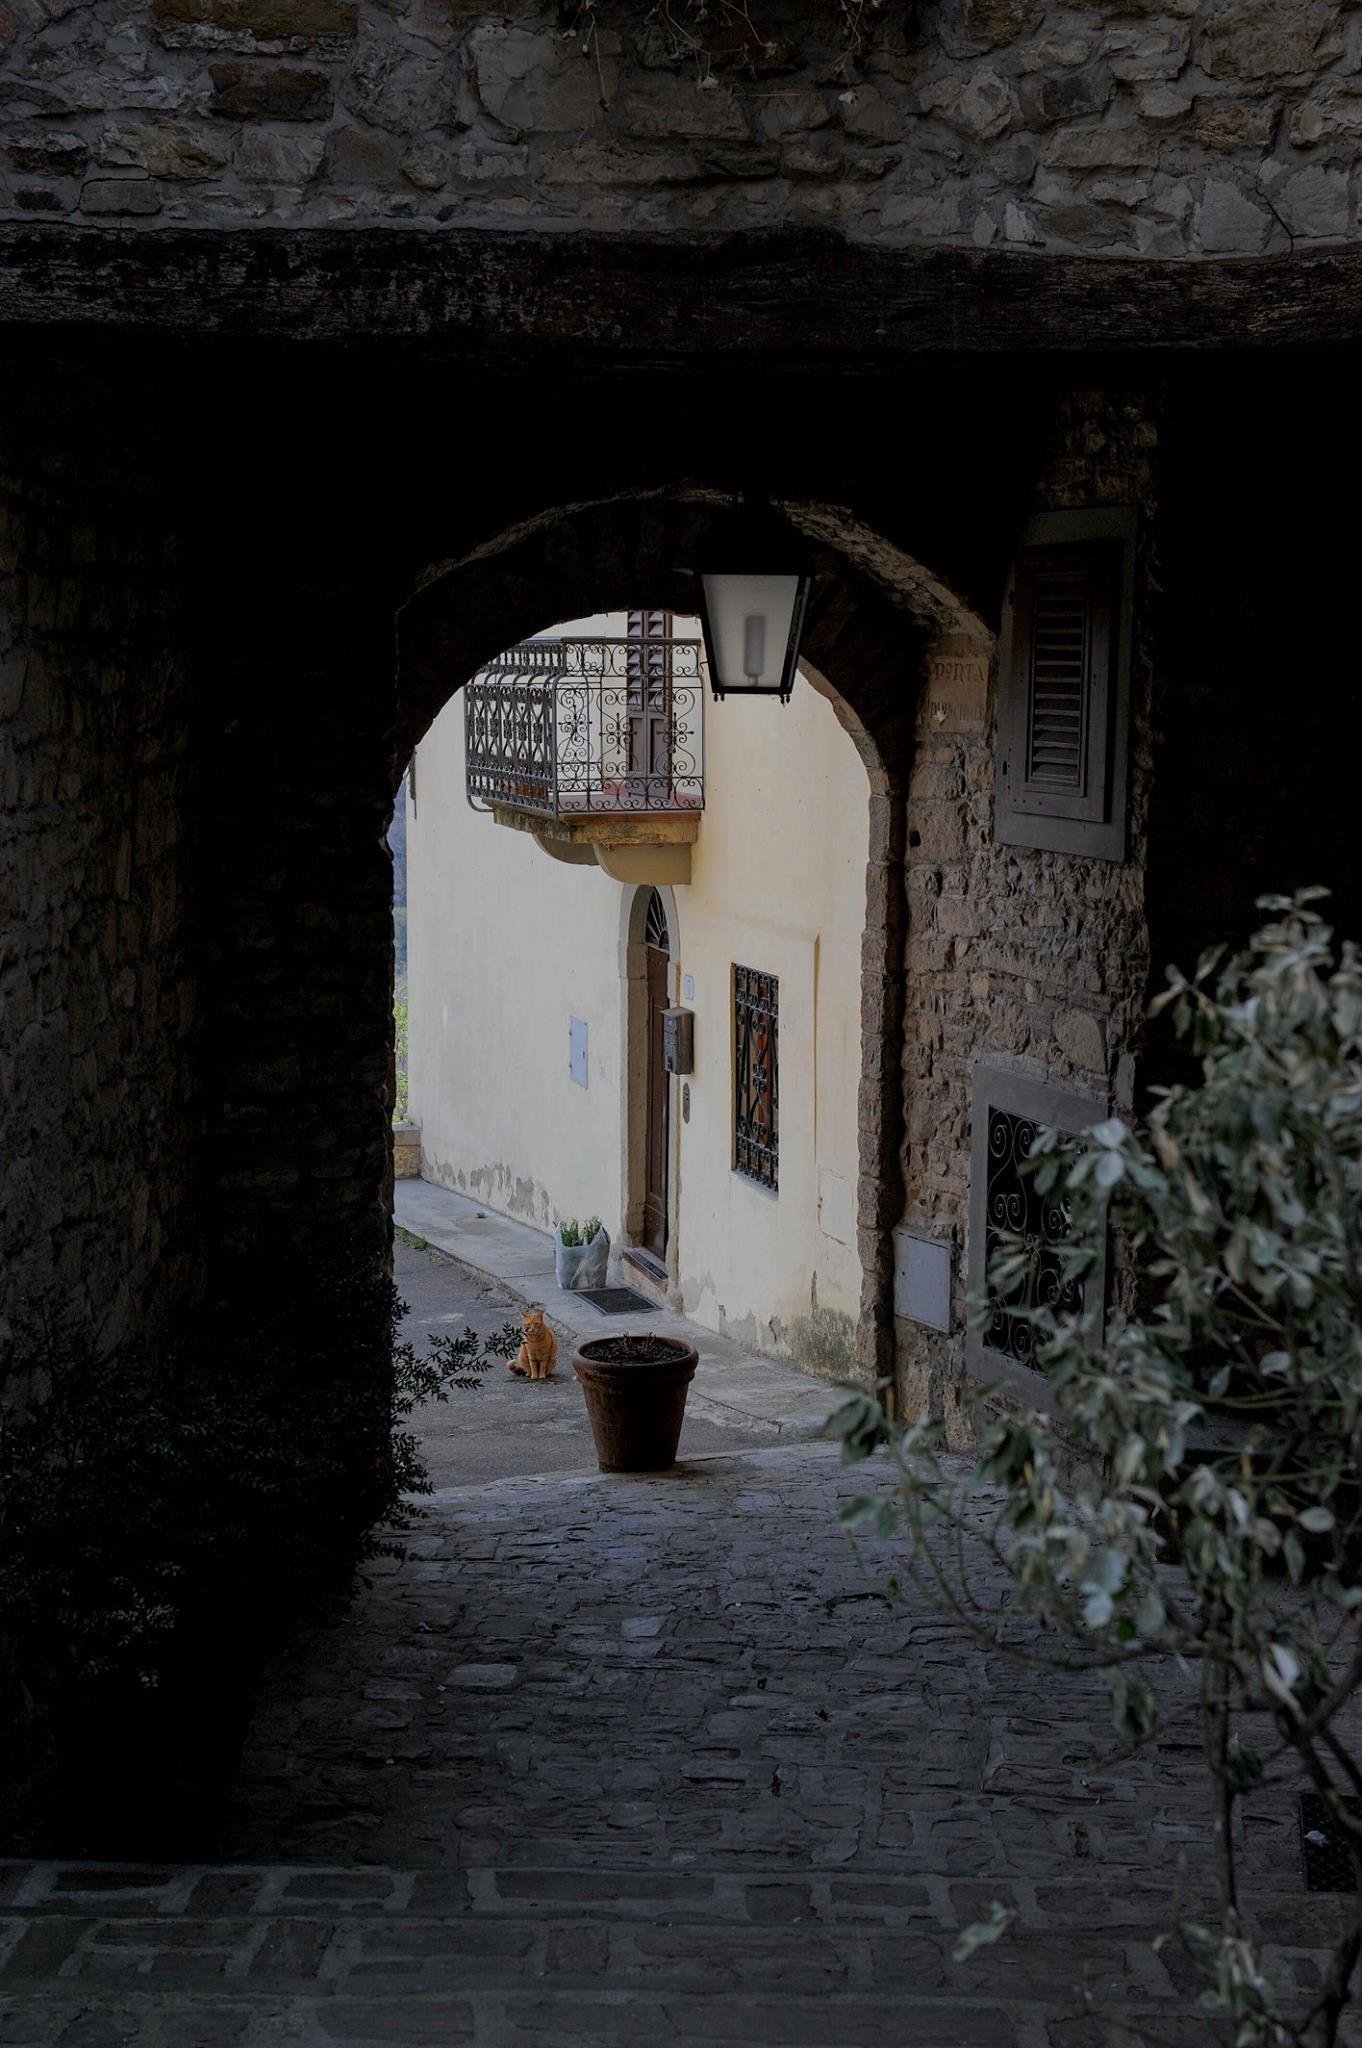 Big Red - Tuscany, Italy 2016 by Robert Malin Young